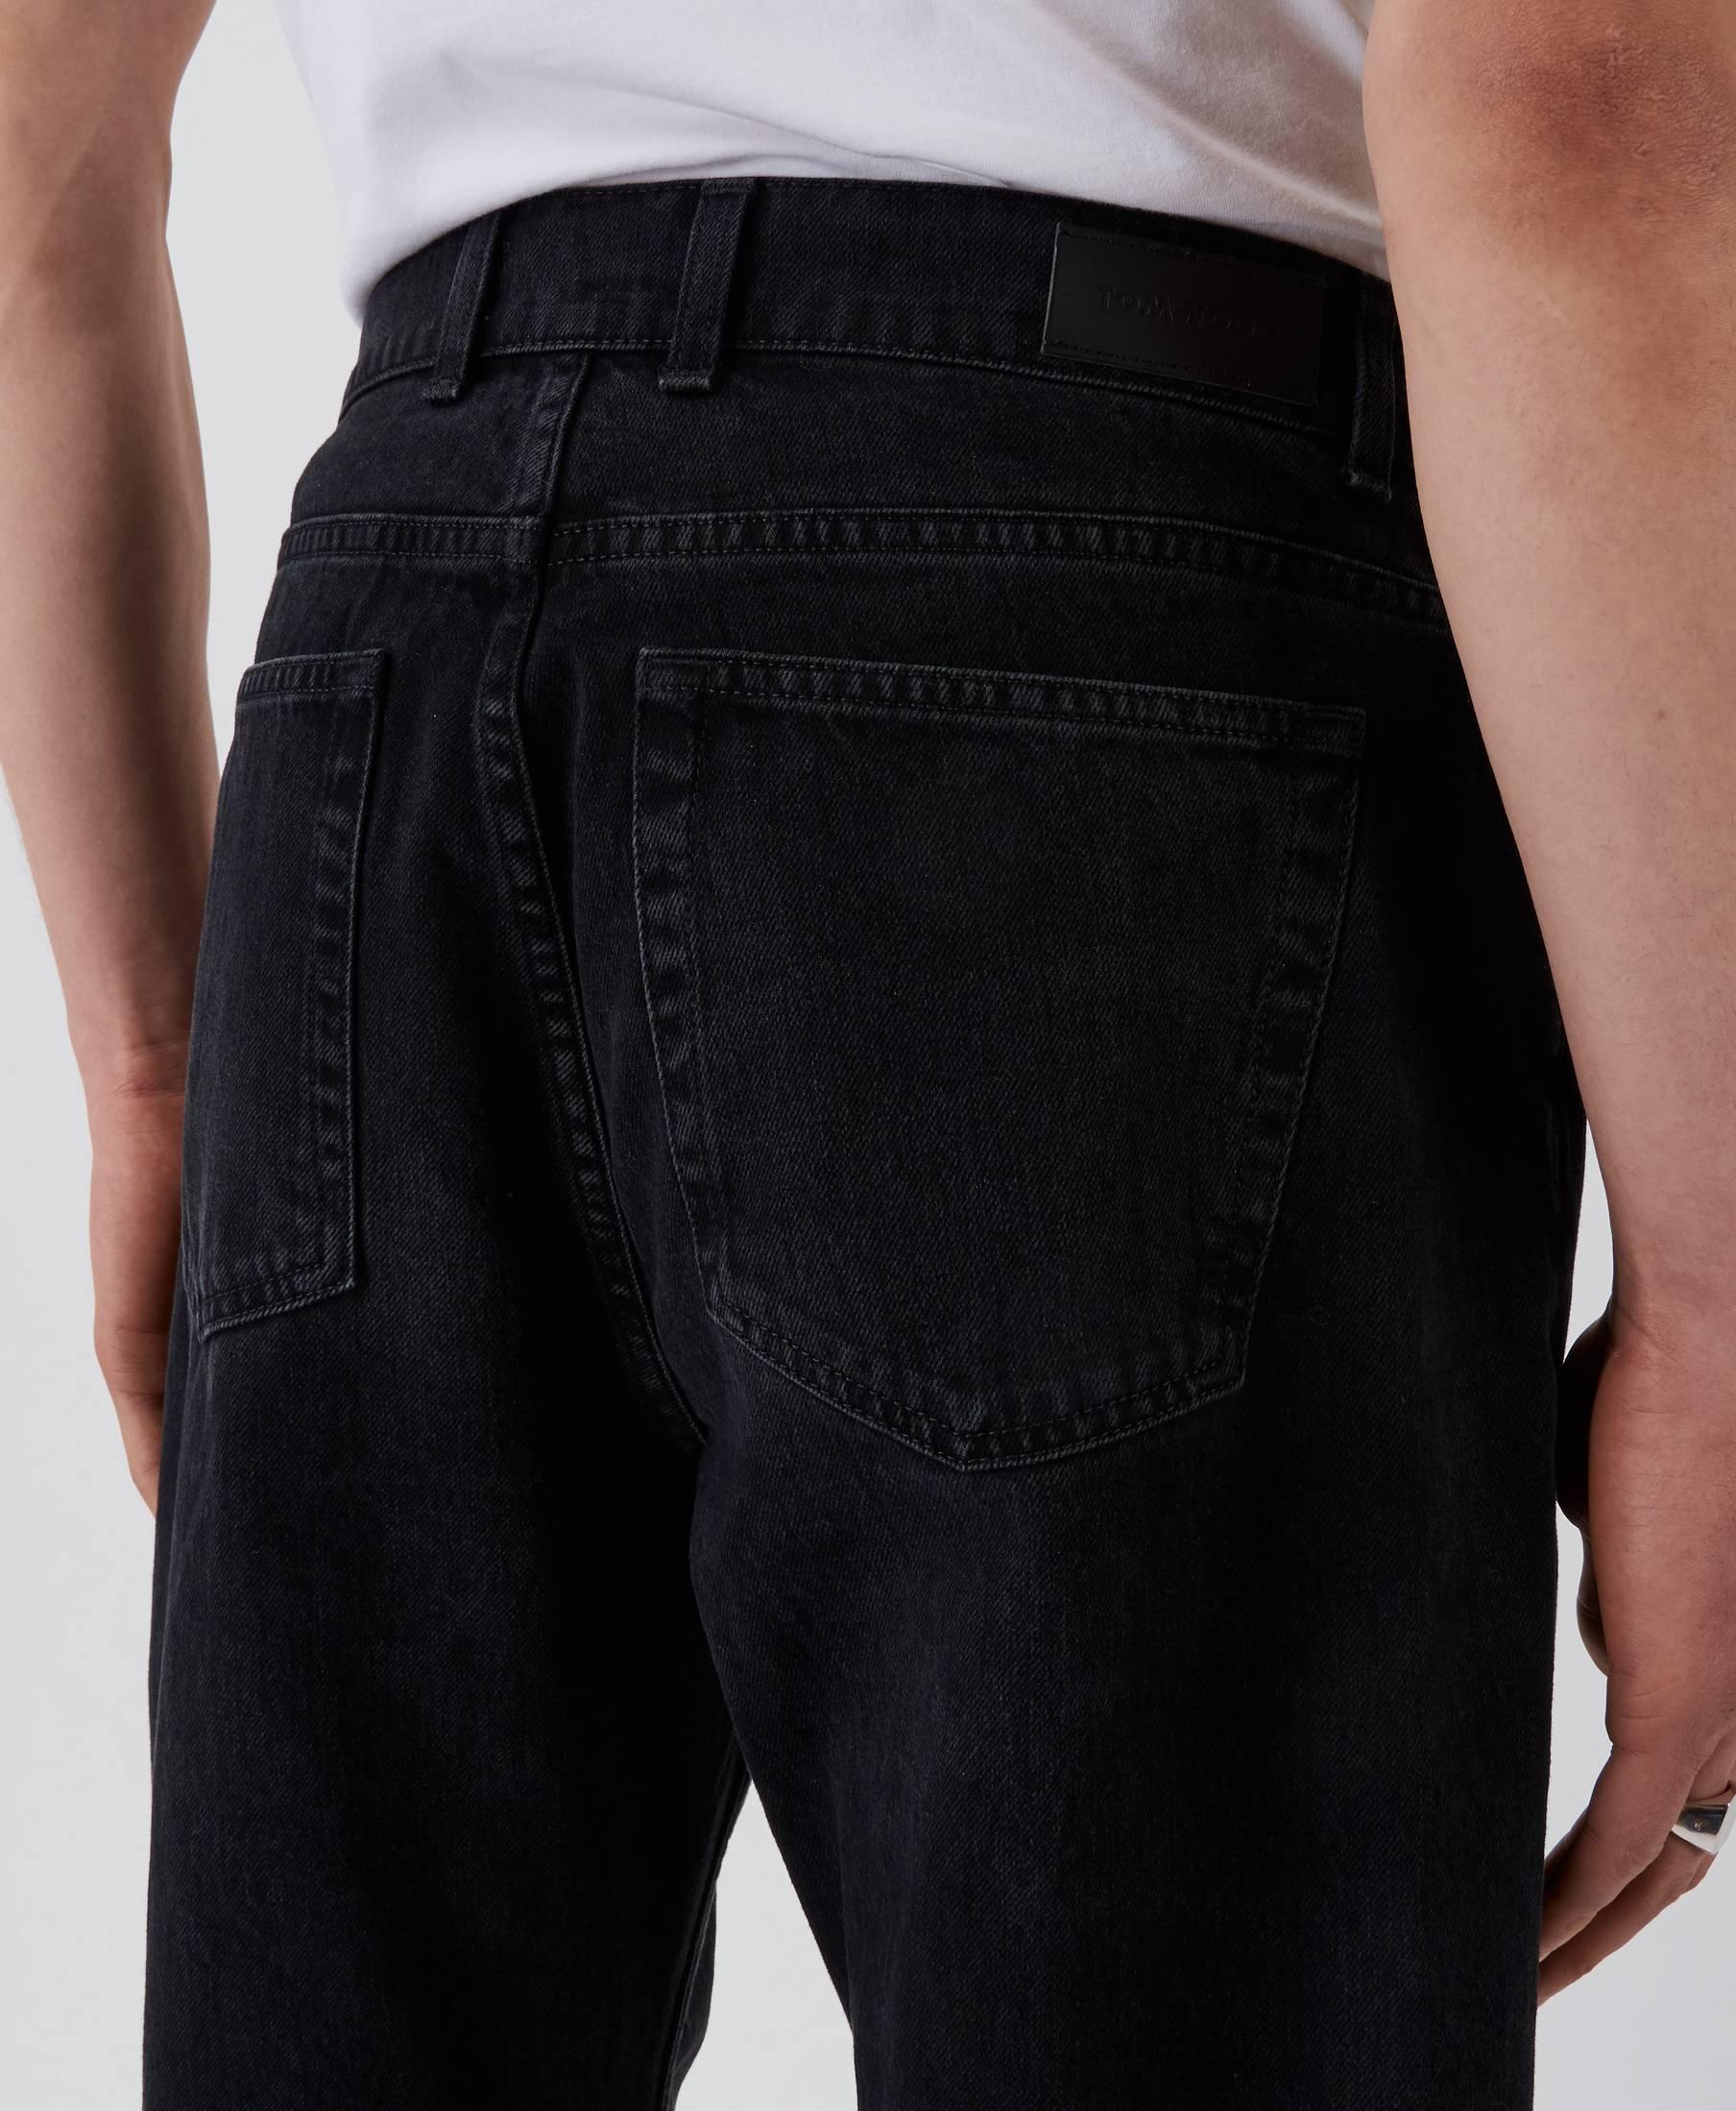 Sonic Denim Pants Used Black